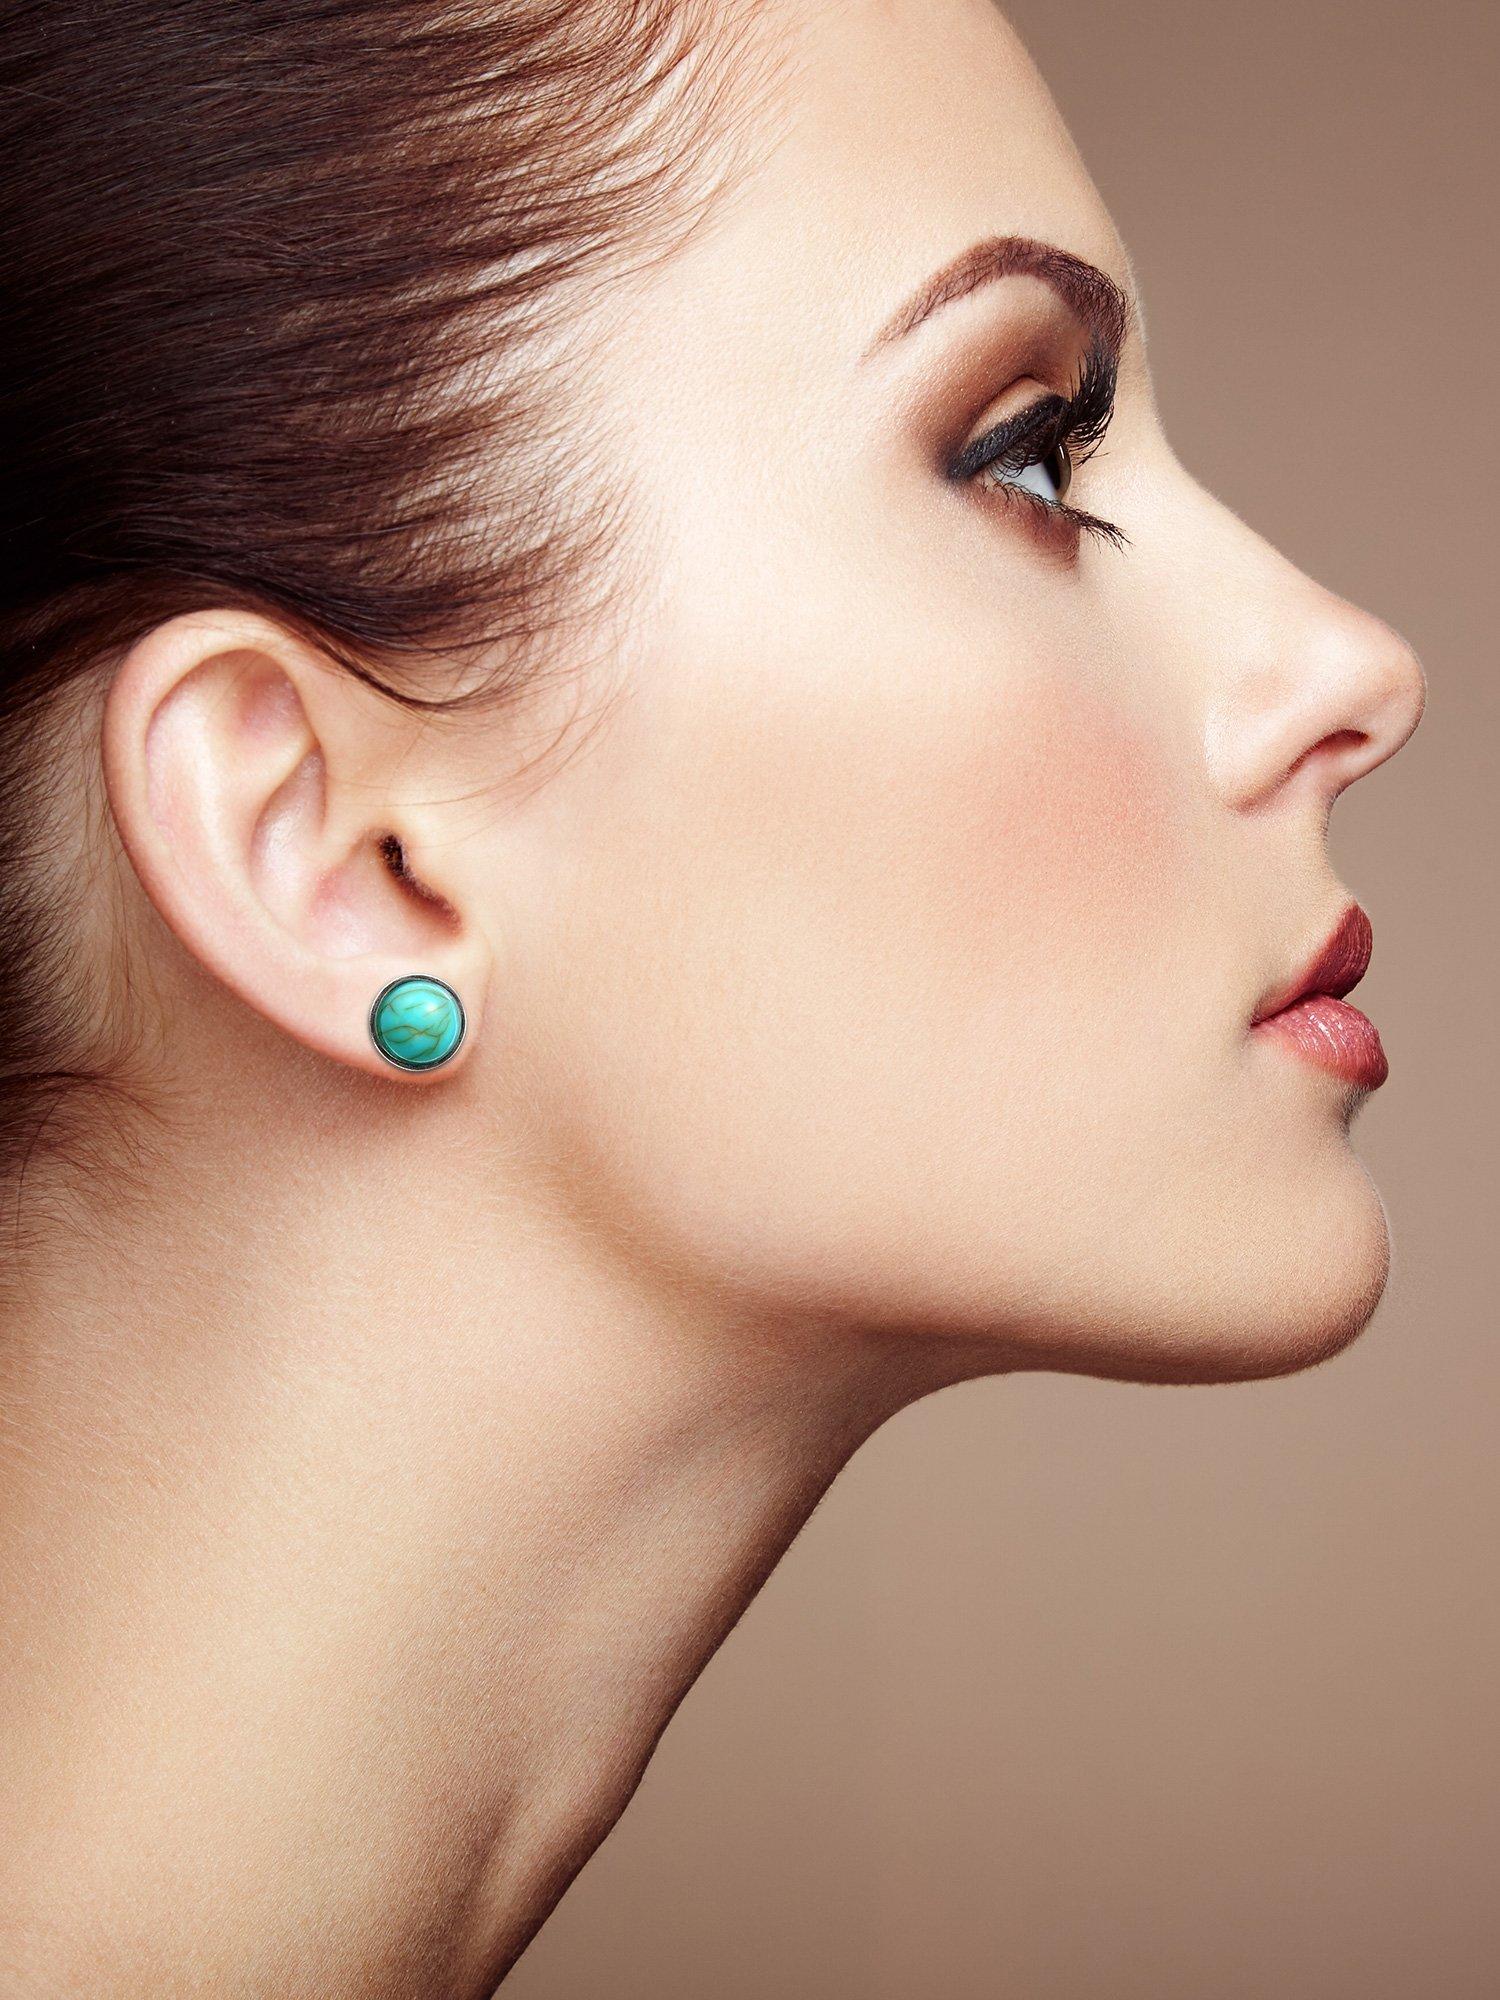 Delicate Stud Earrings